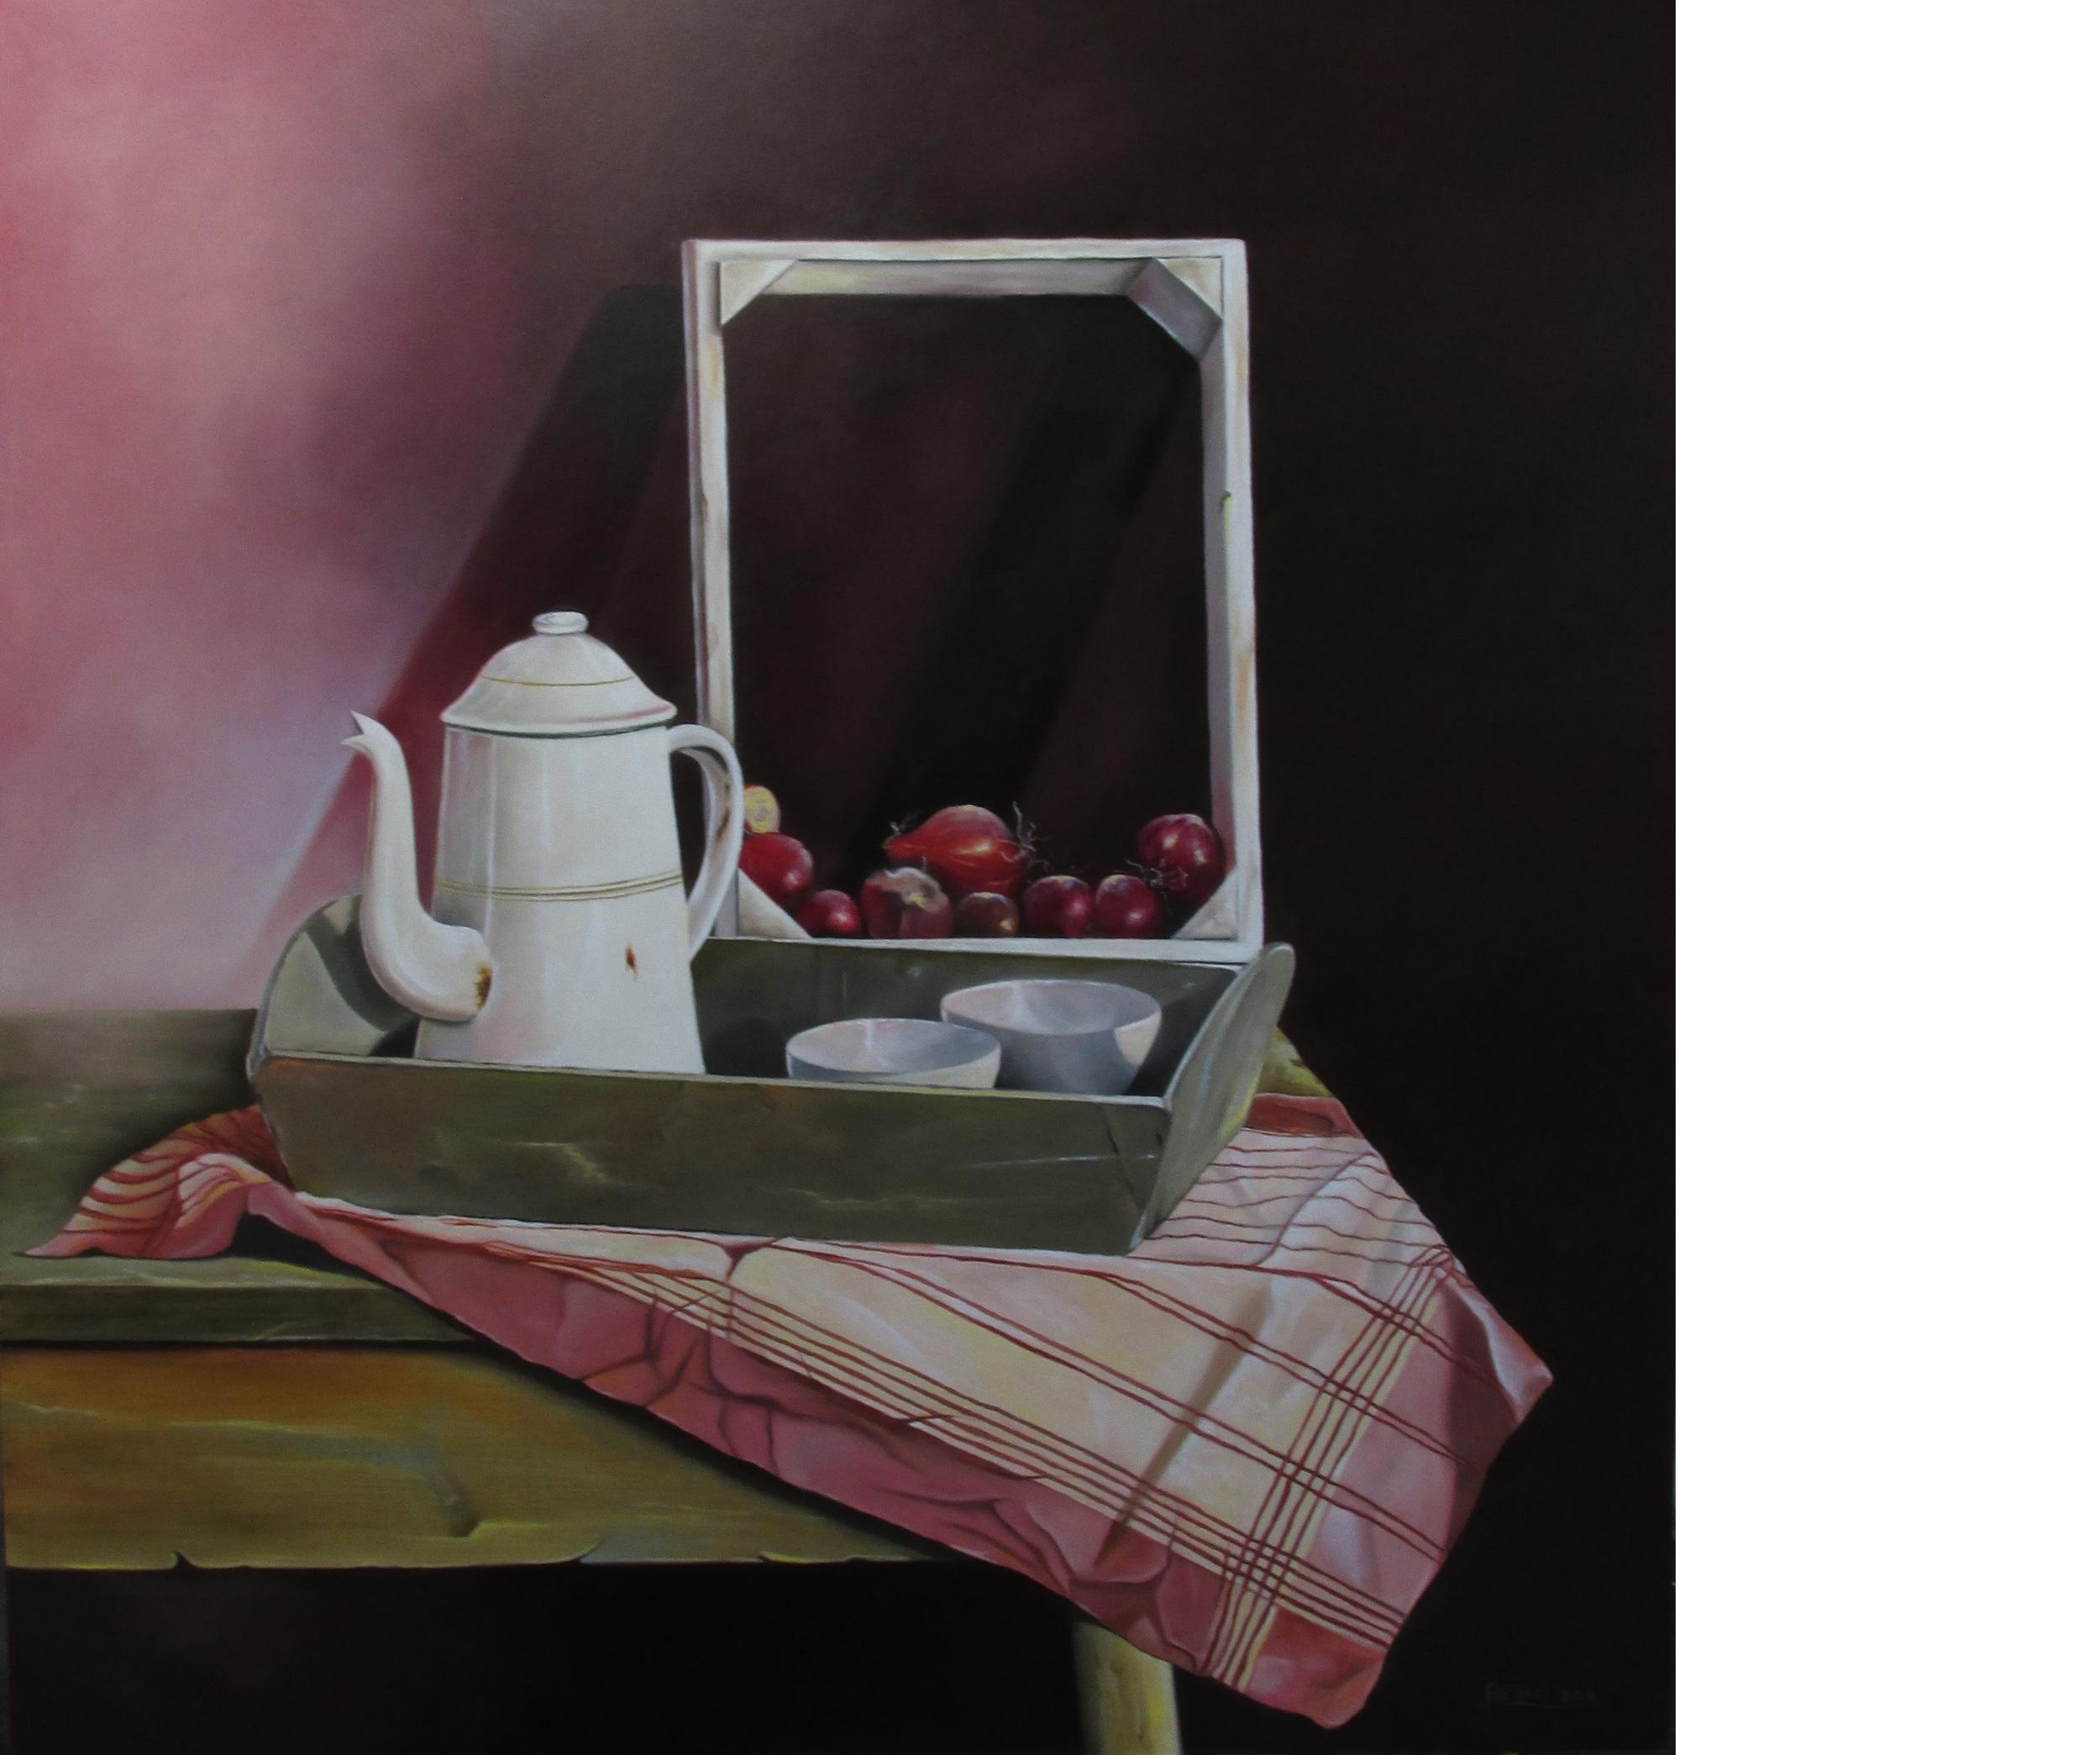 Stilleven met koffiekan en rode uien - olieverf op masonite (paneel) 64x60 cm